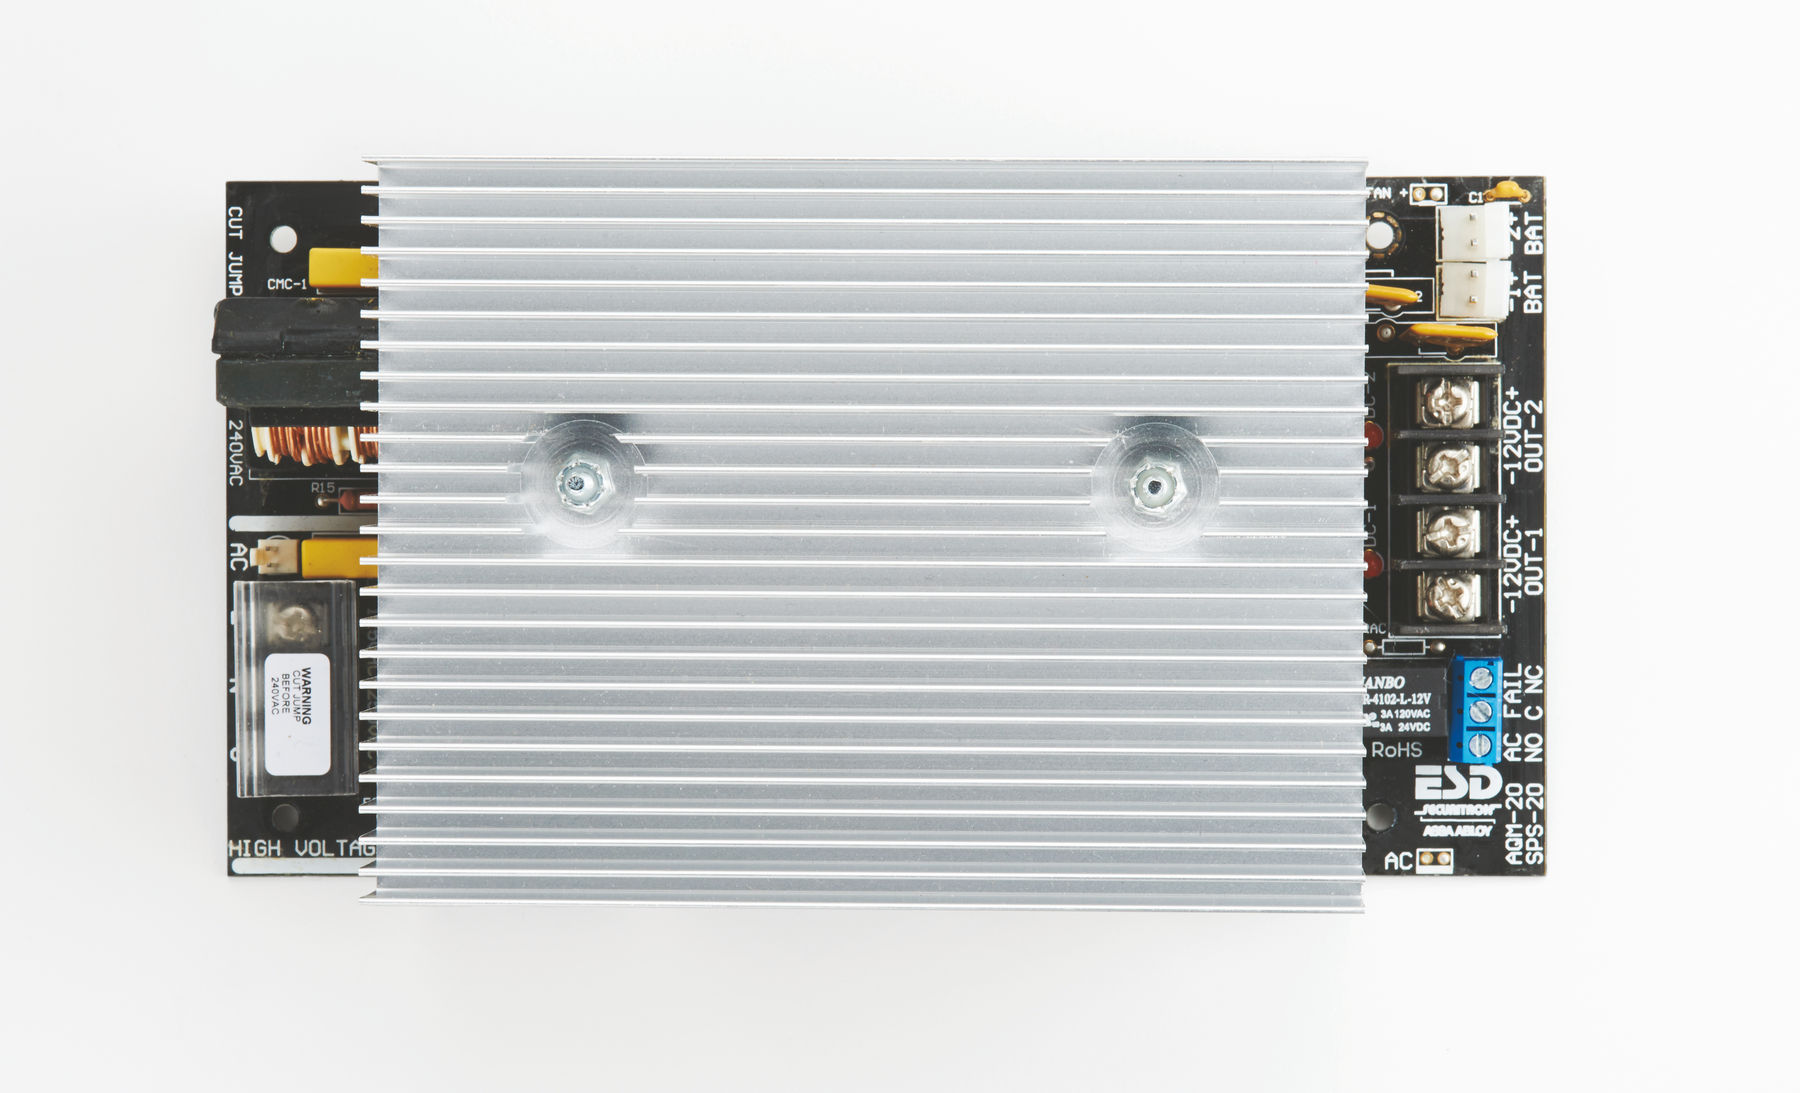 von duprin electric strike wiring diagram securitron